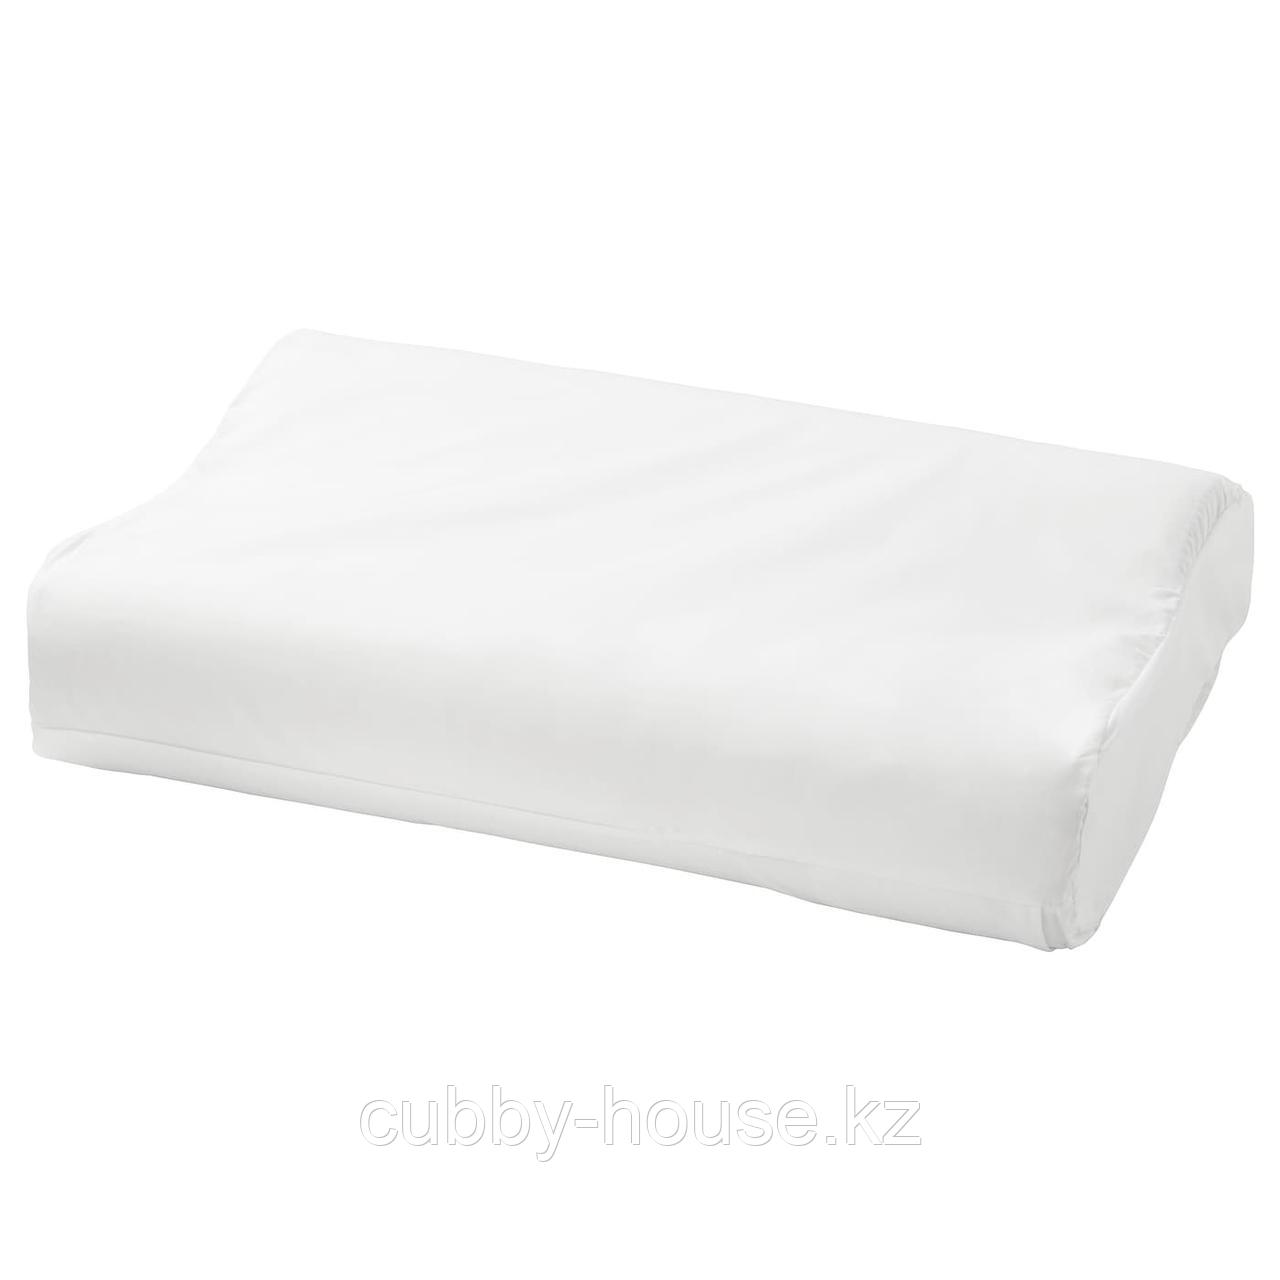 РОЗЕНСКЭРМ Наволочка для эргоном подушки, белый, 33x50 см